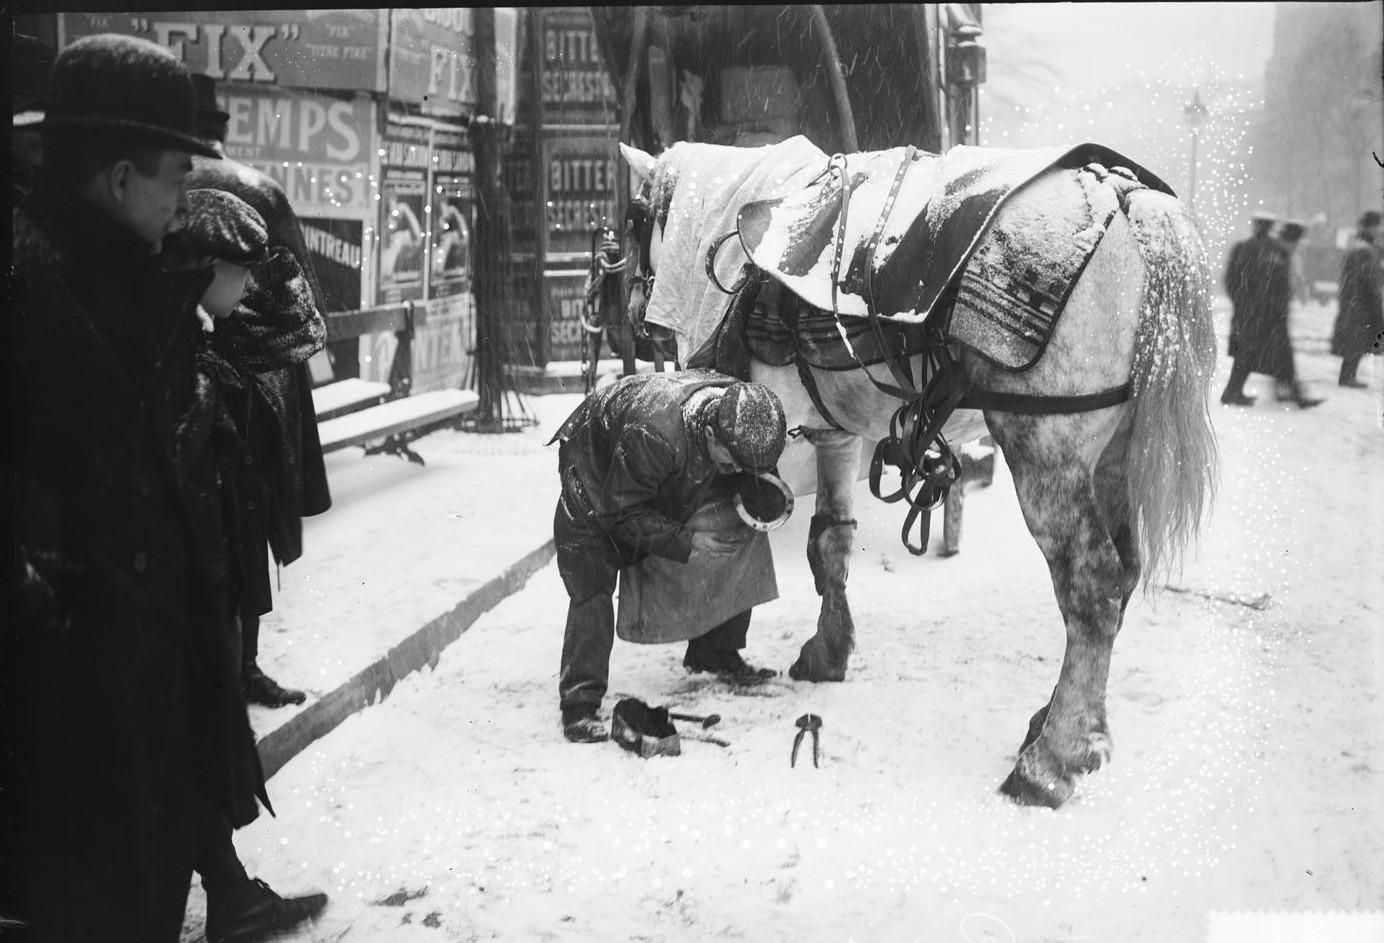 1908. Сцена во время снегопада